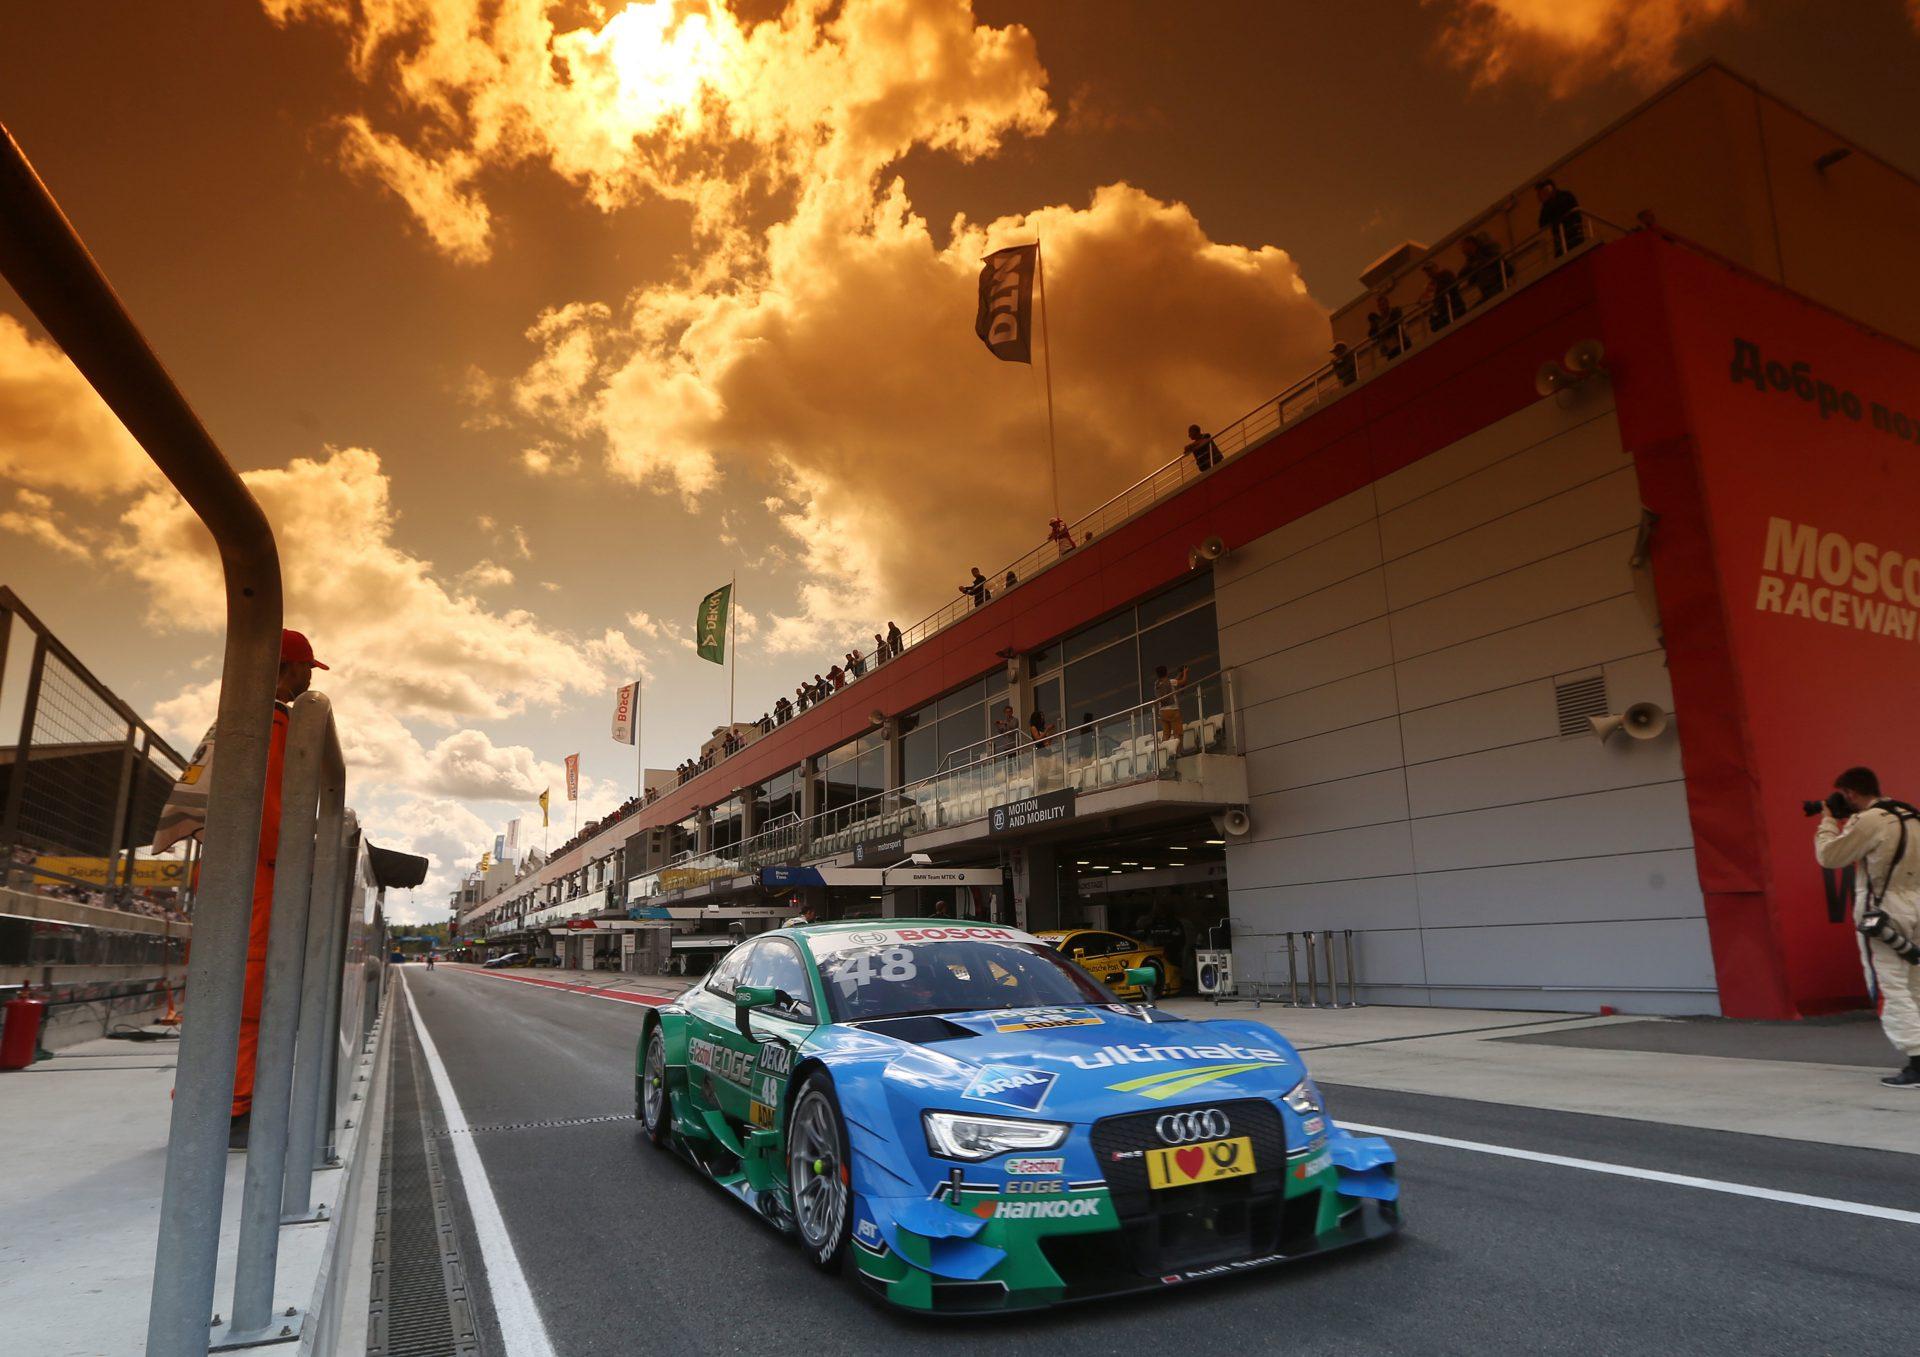 Castrol EDGE Audi RS 5 DTM #48 (Audi Sport Team Abt), Edoardo Mortara